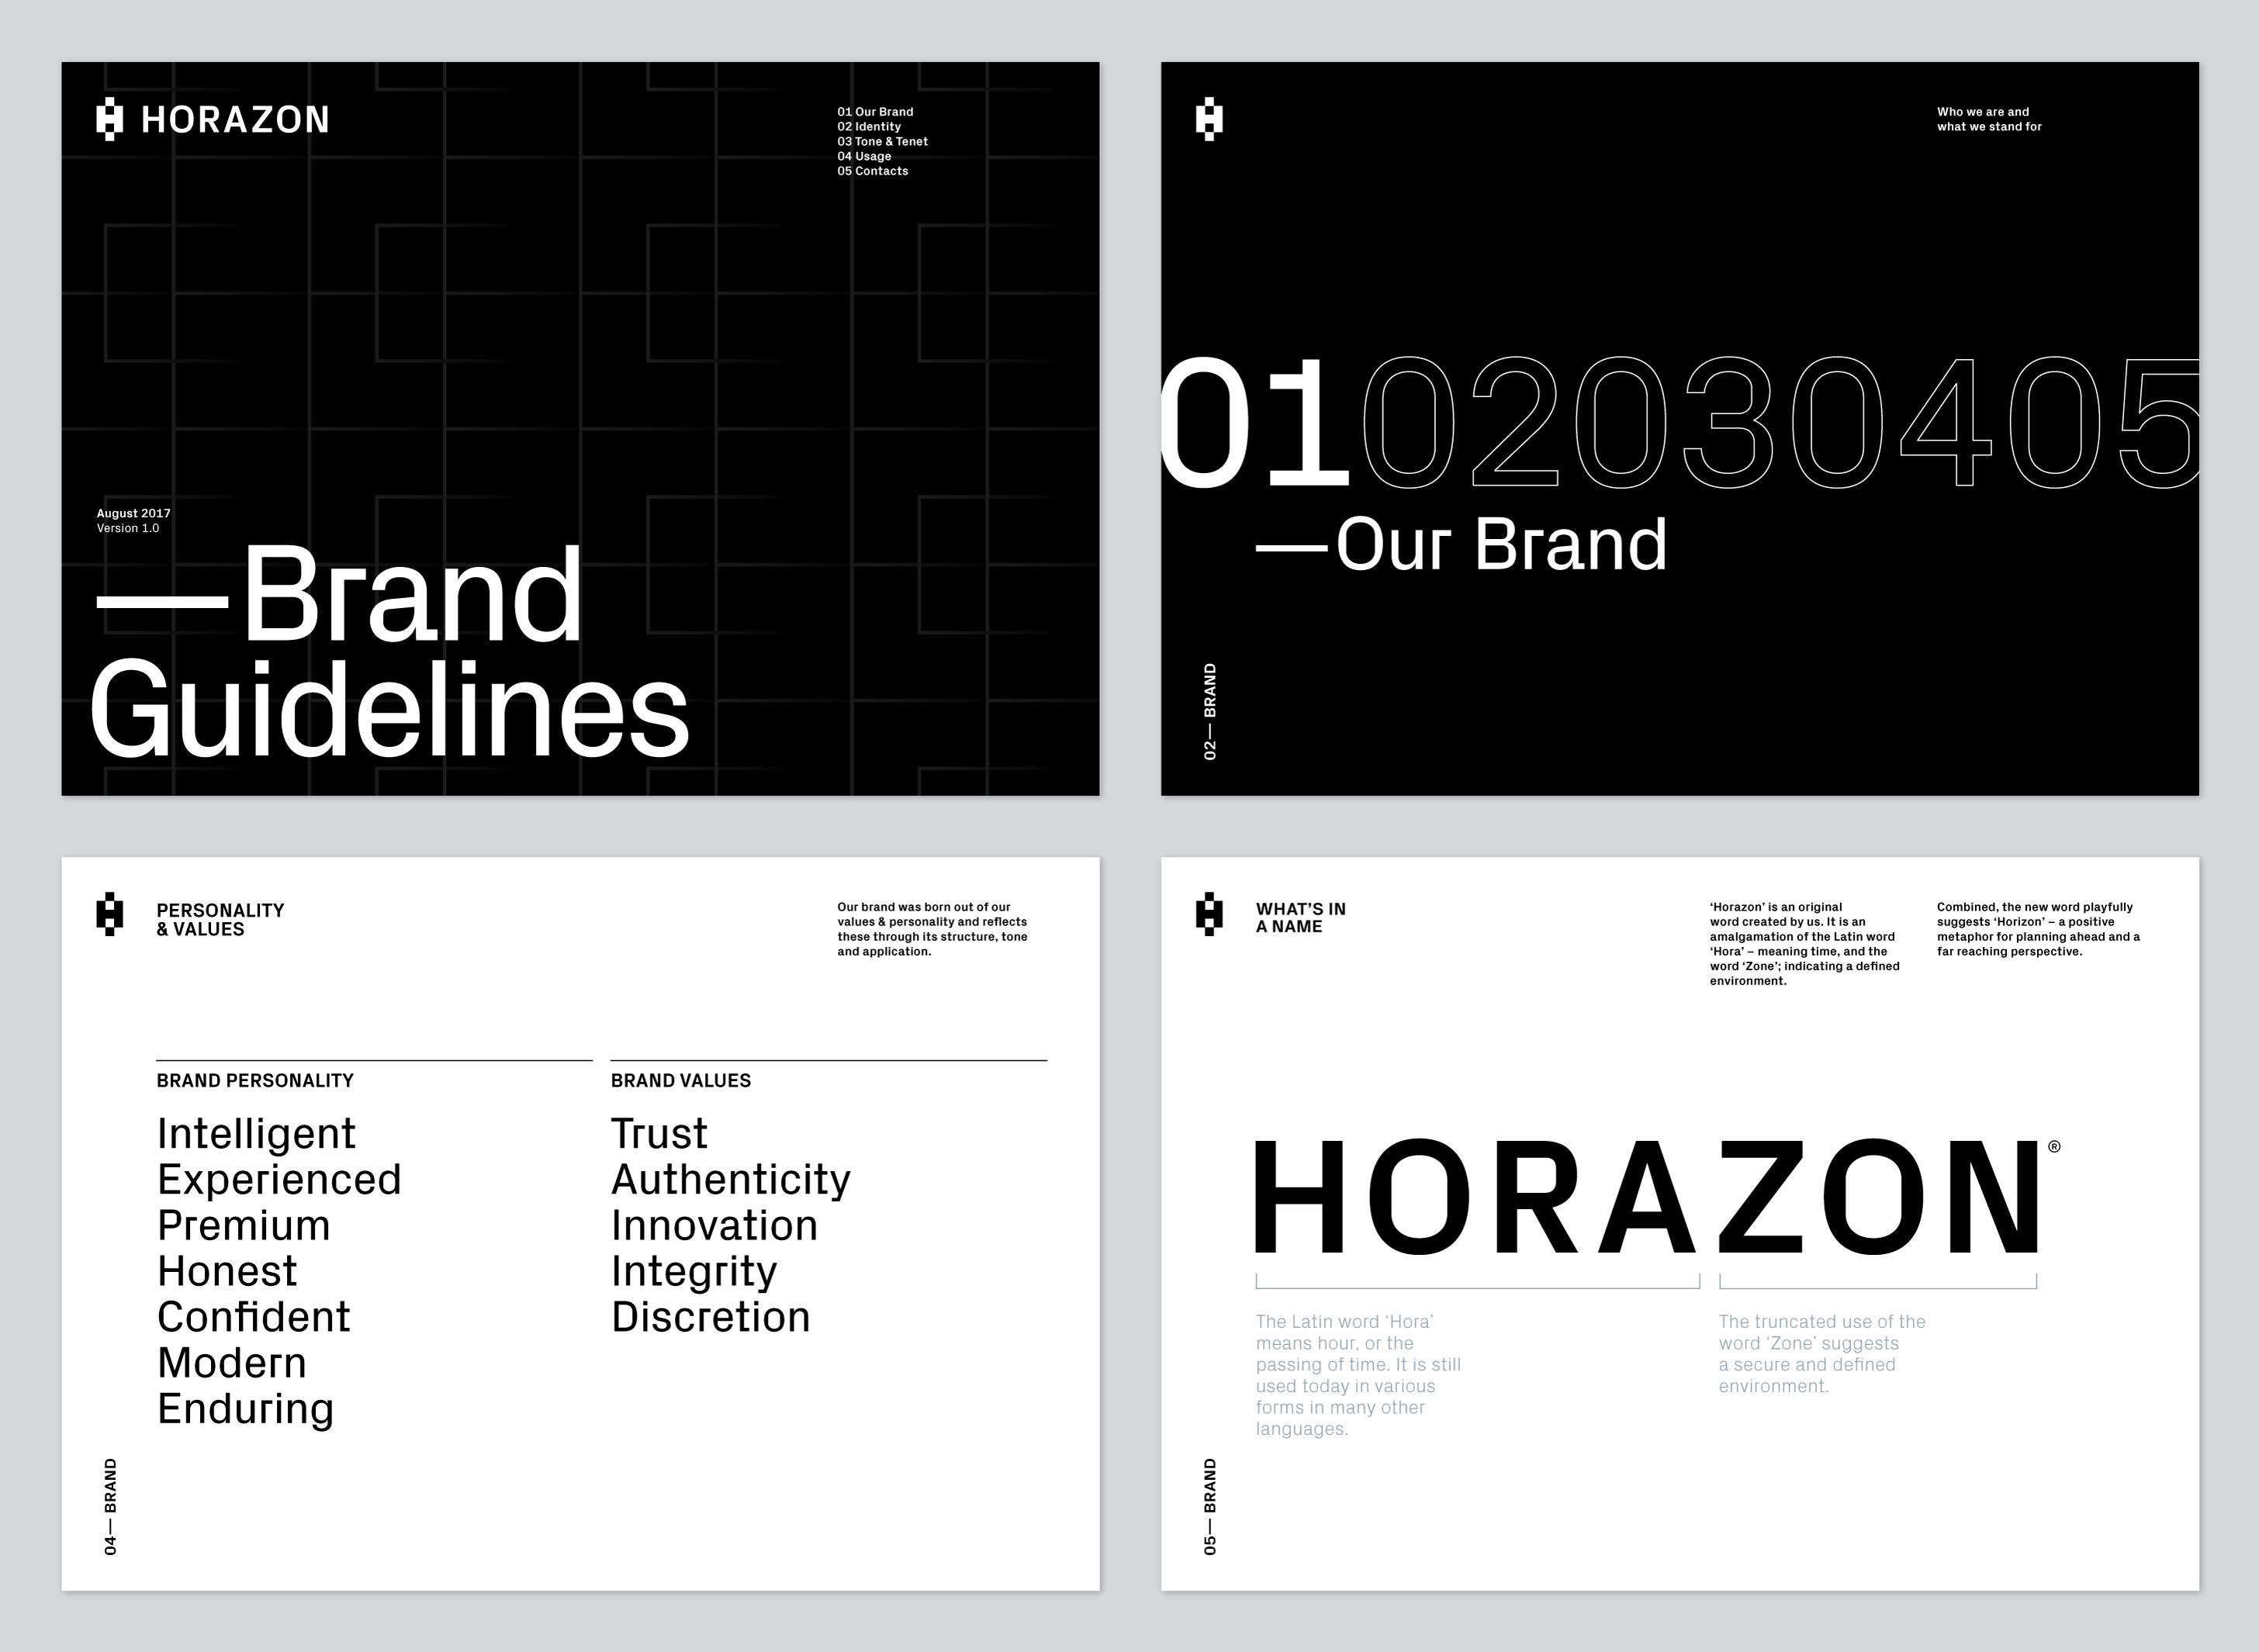 horazon-brand-guidelines-01